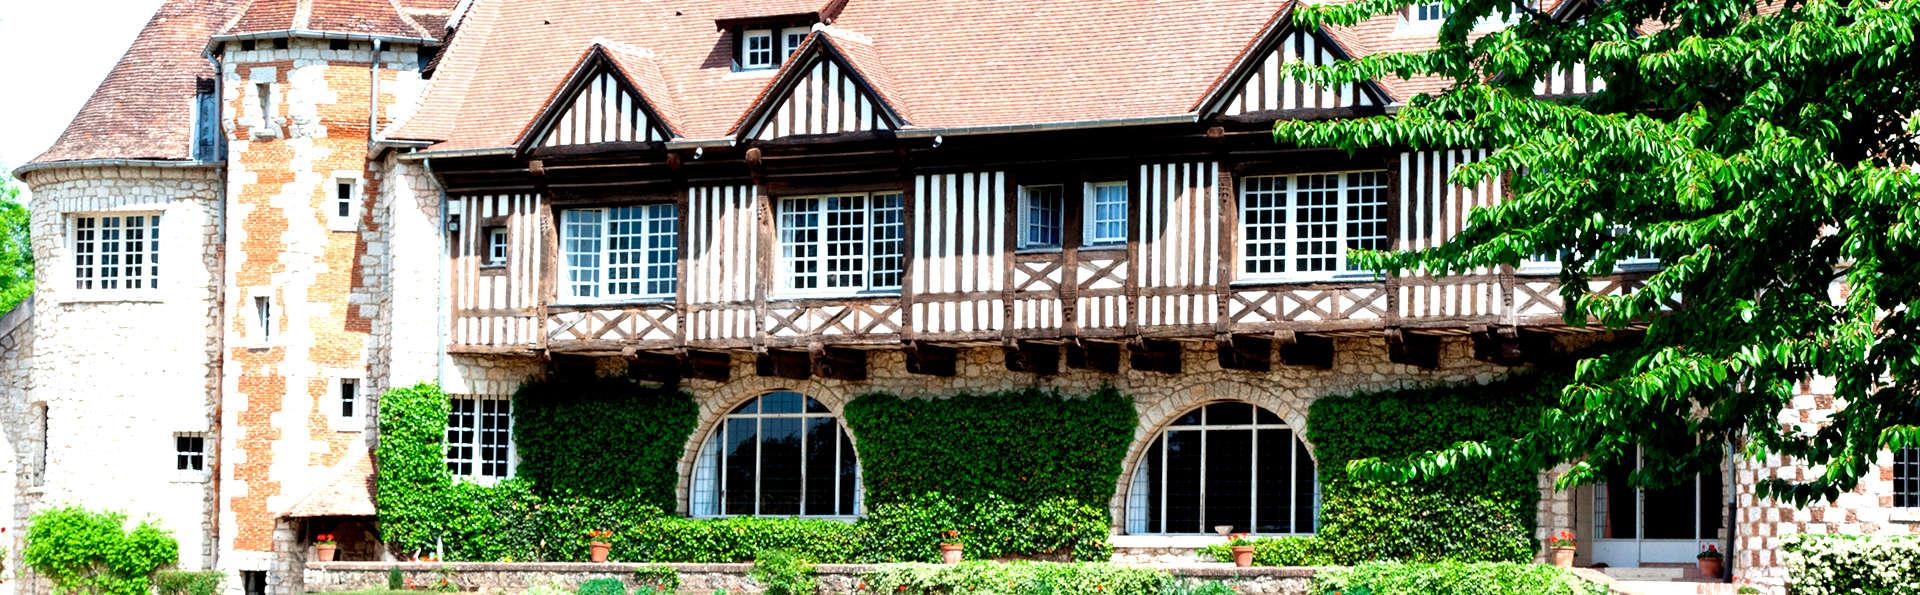 Manoir de Beaumarchais - Edit_Front2.jpg